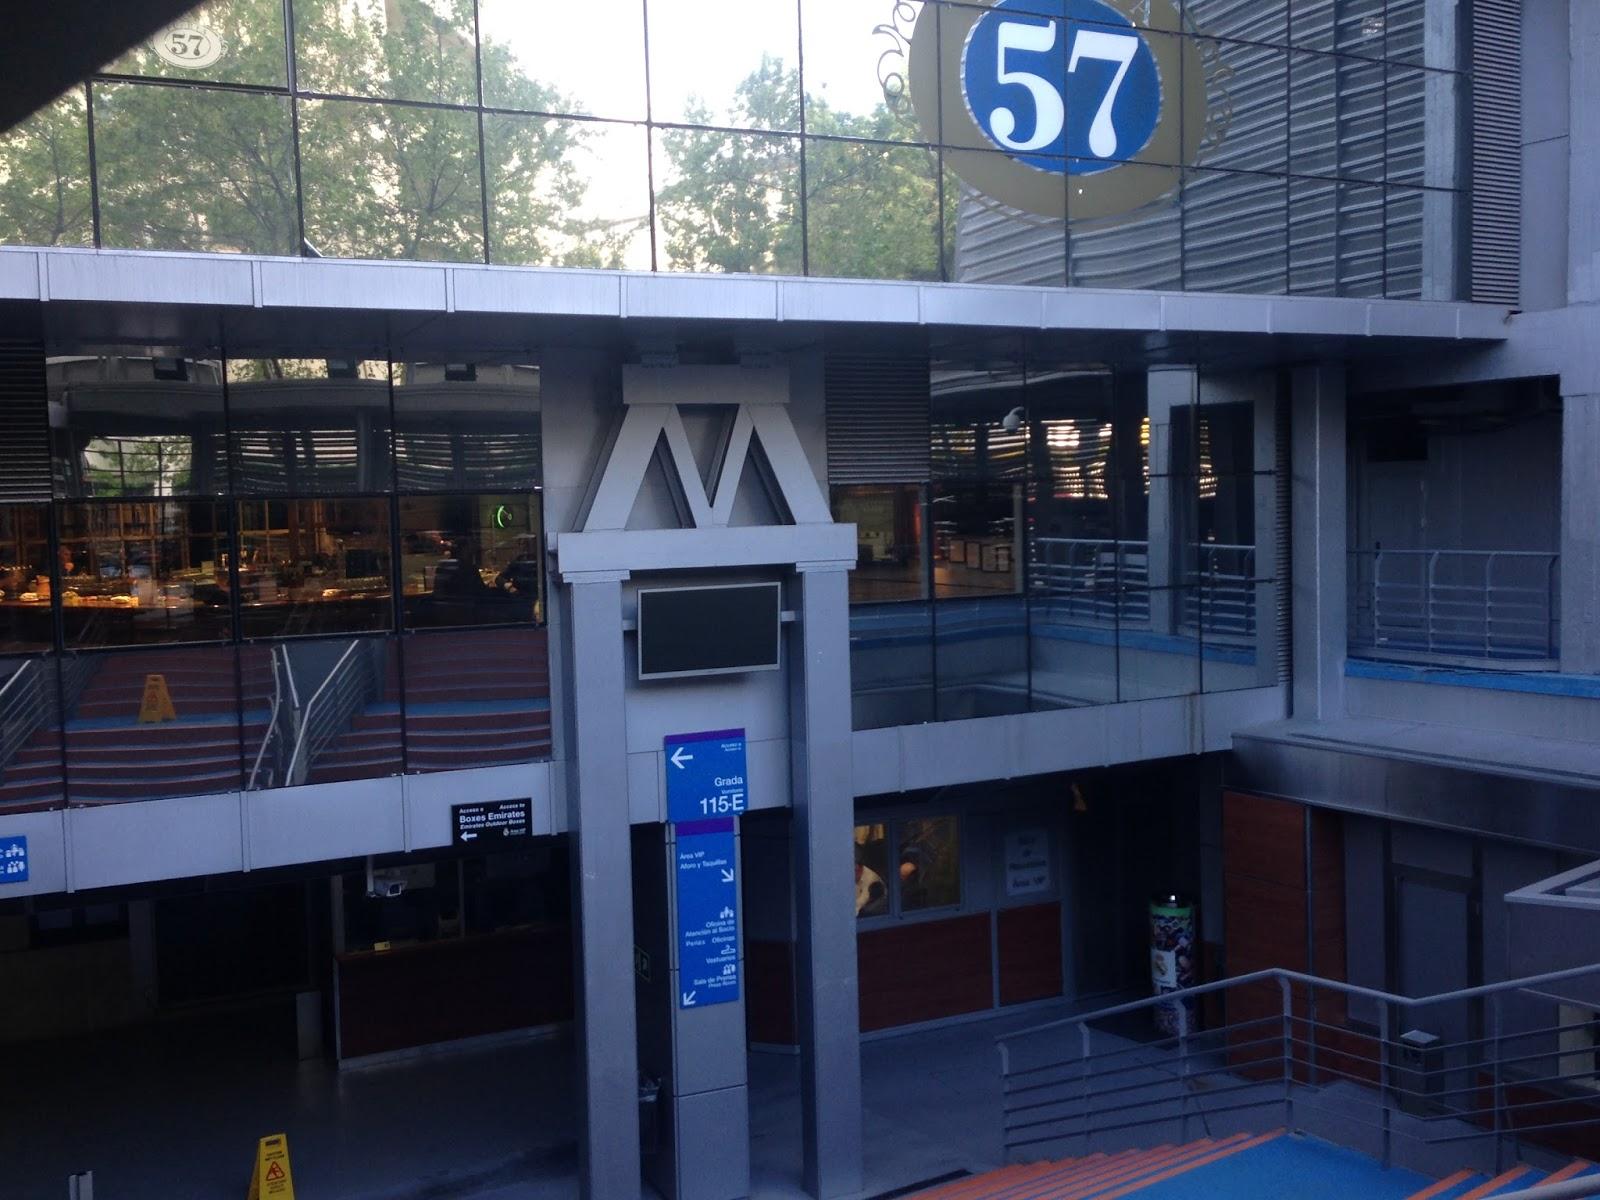 Puerta 57 madrid for Puerta 57 restaurante